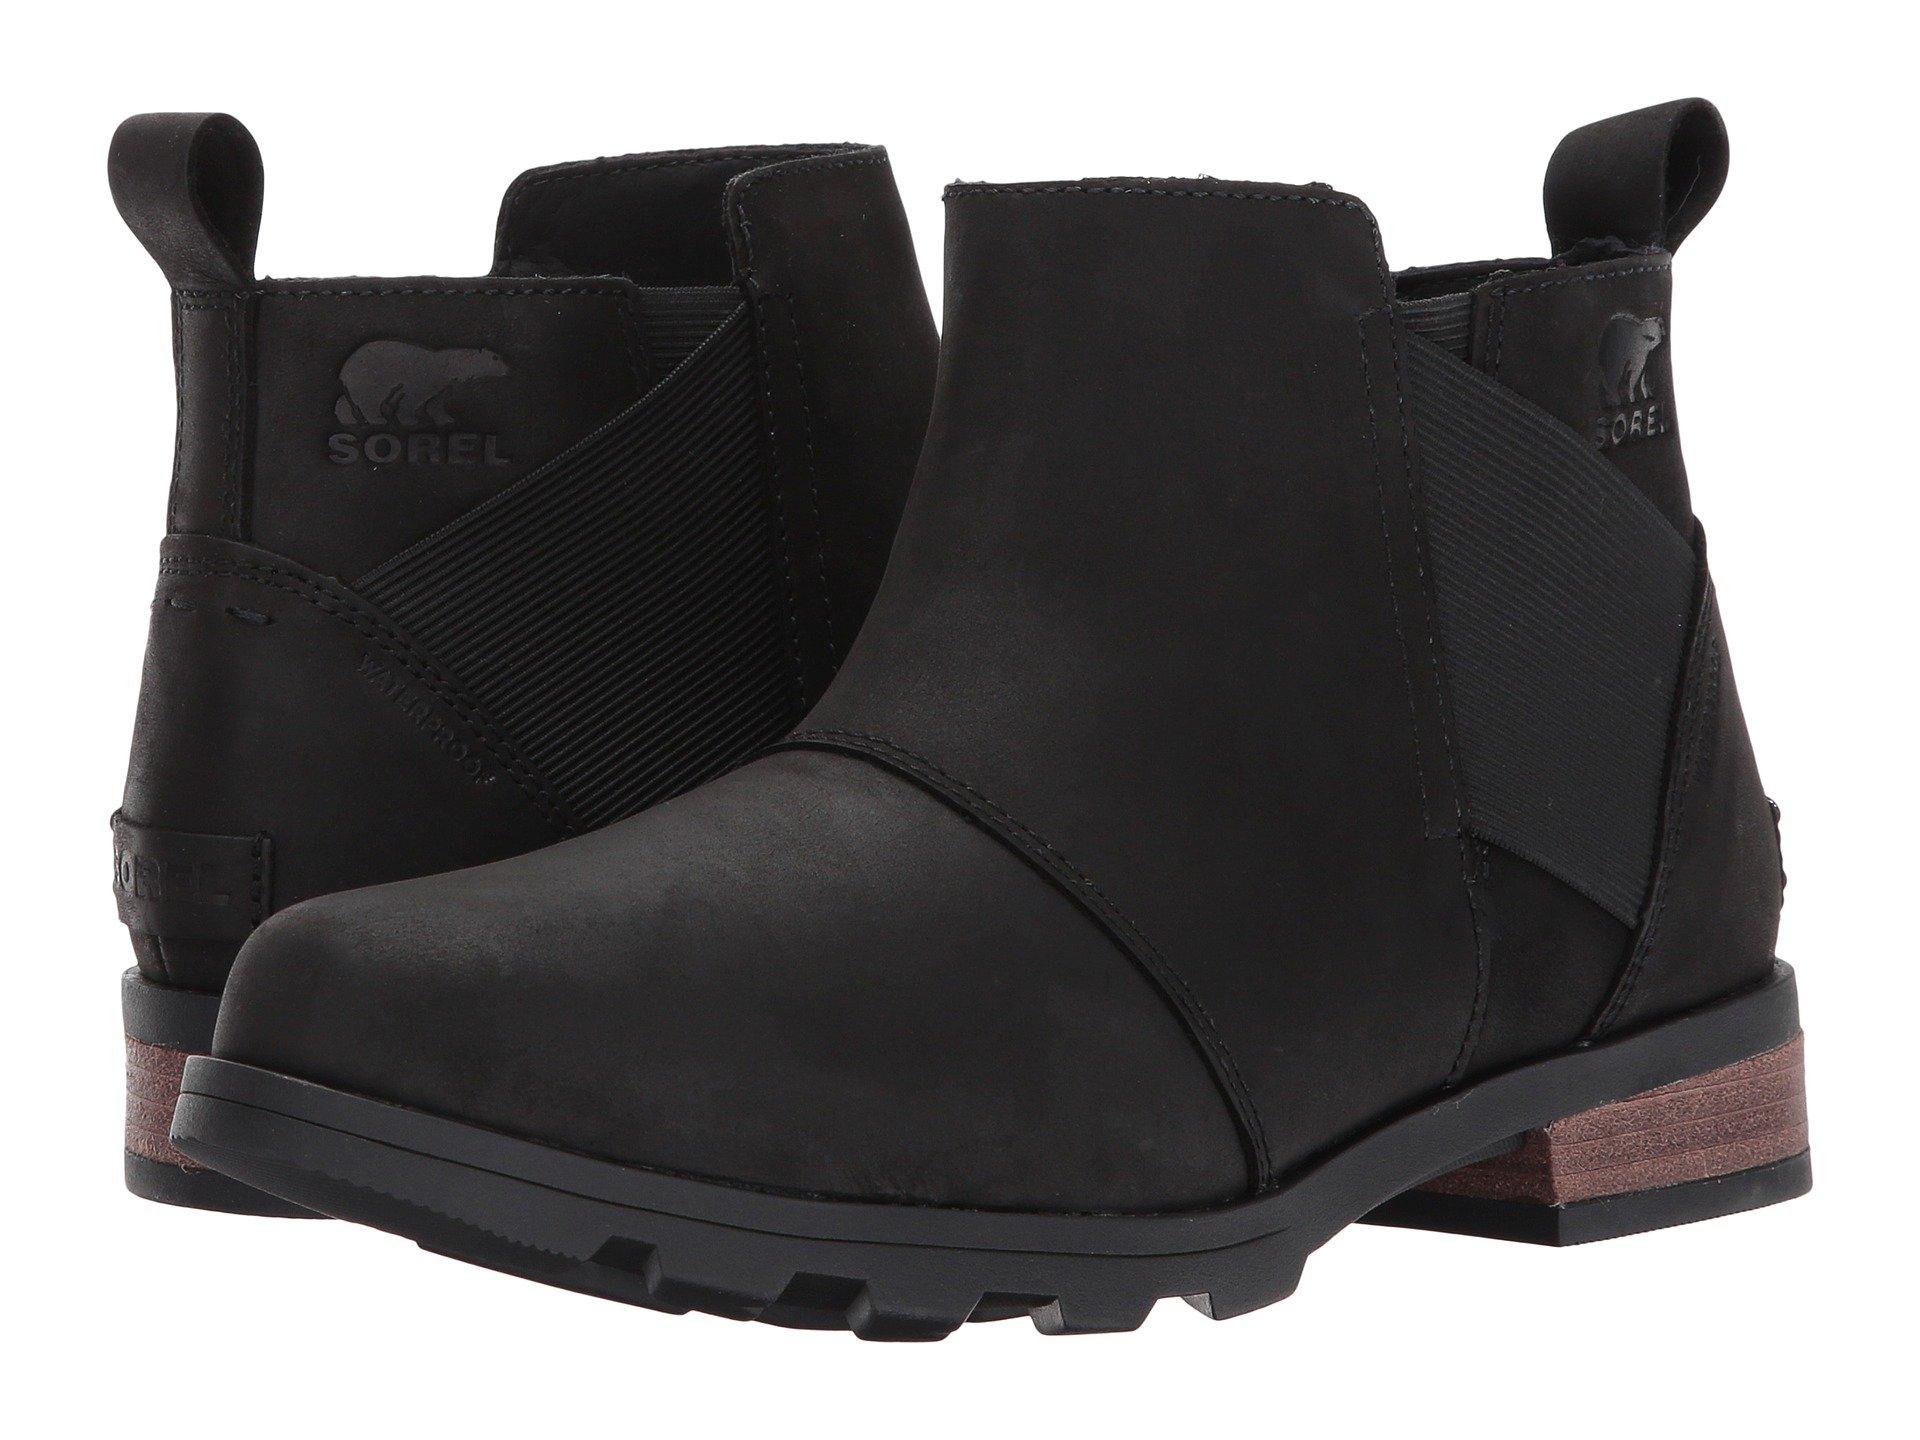 b1b5434392cbf6 Women s SOREL Boots + FREE SHIPPING